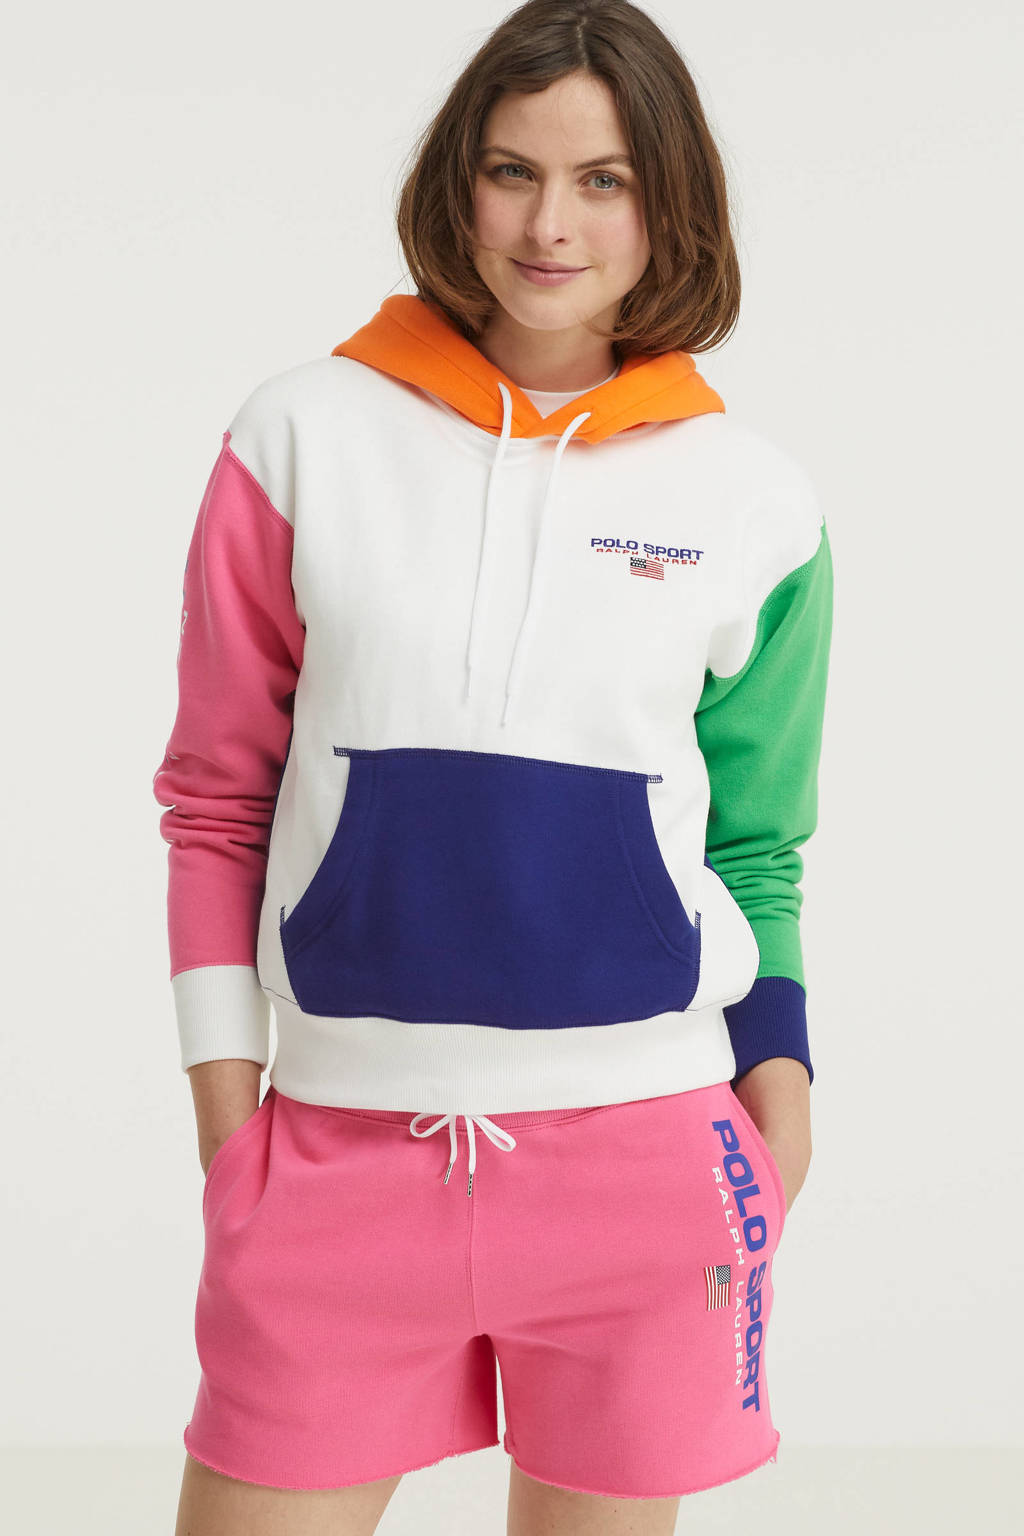 POLO Ralph Lauren trui donkerblauw/roze/groen/oranje, Donkerblauw/roze/groen/oranje